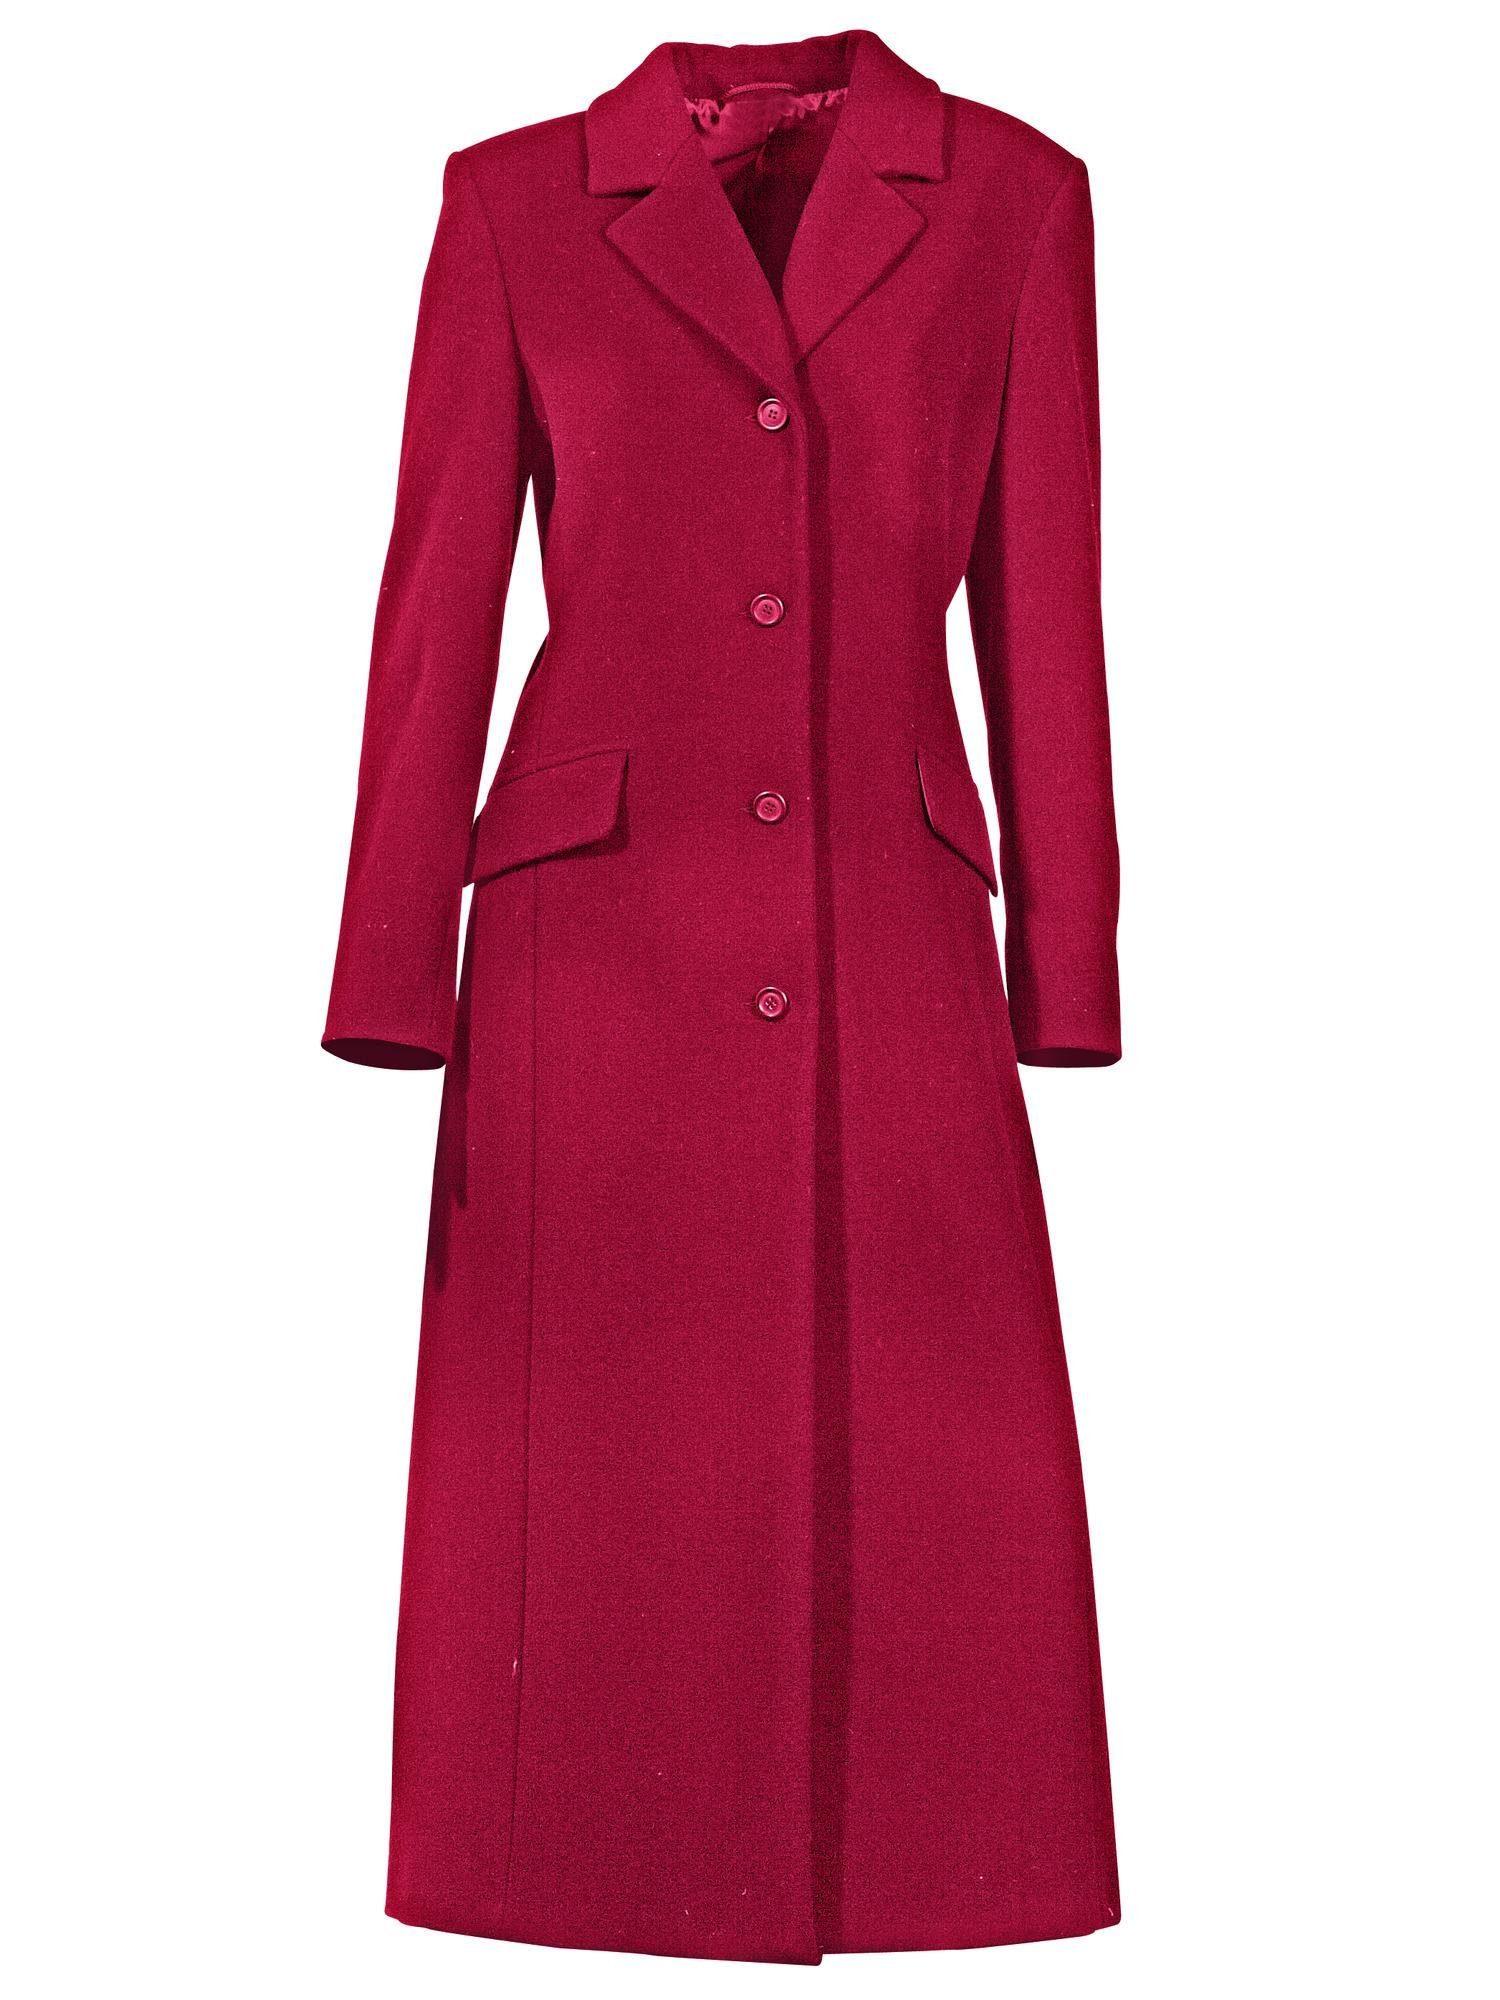 Dames Mantels Sale Jas Wol Vrouwen Herfst Lang Wollen Doek Blauw Roze